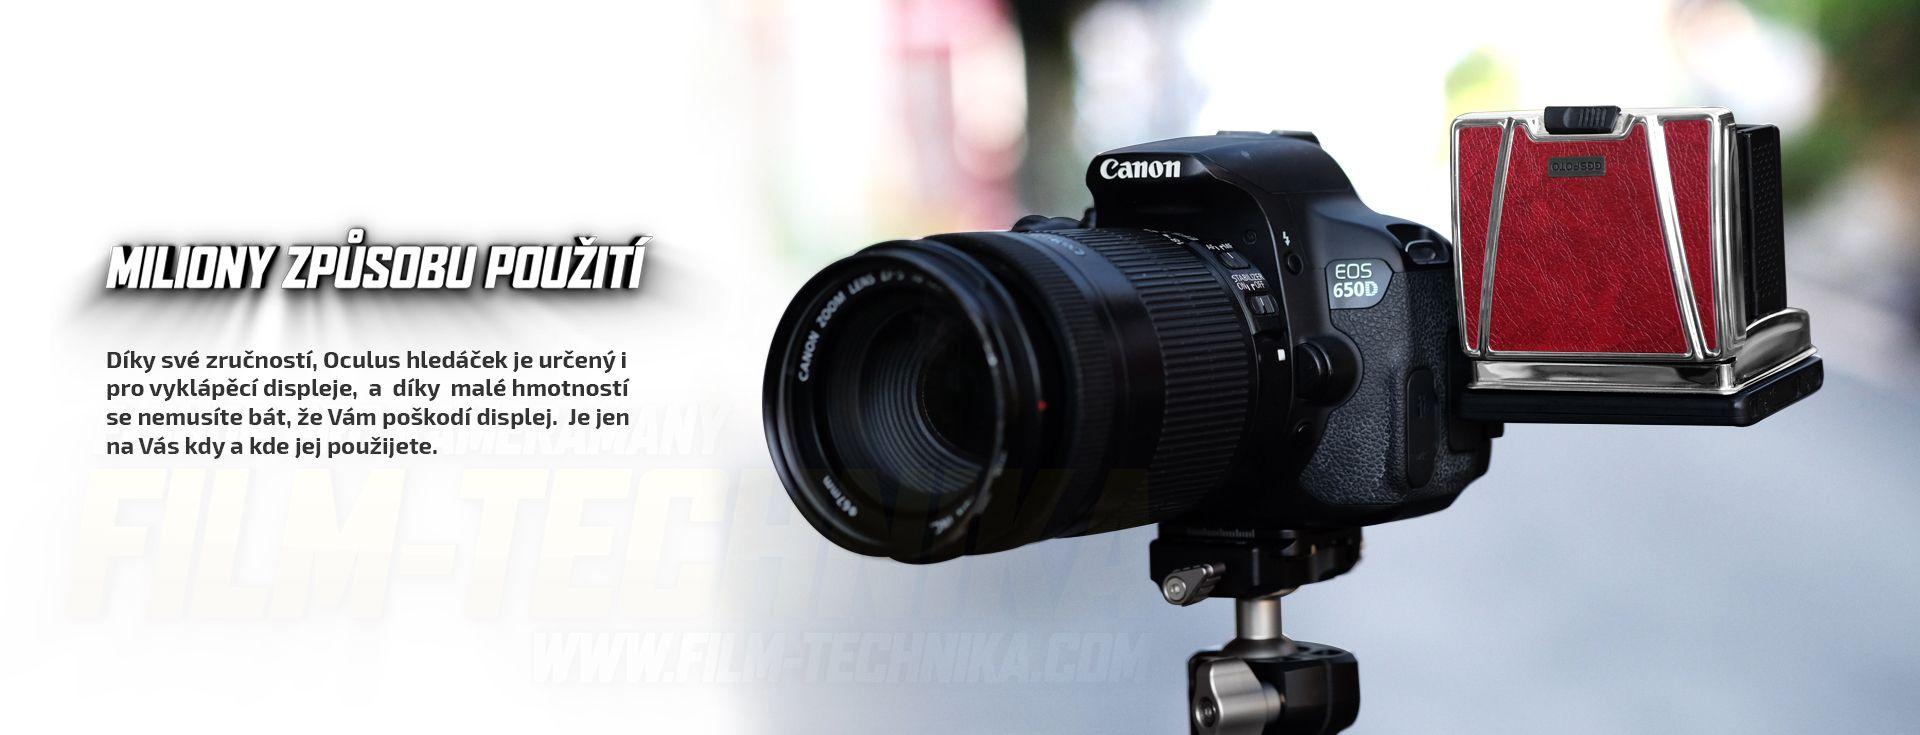 film-technika-ggs-oculus-intext92